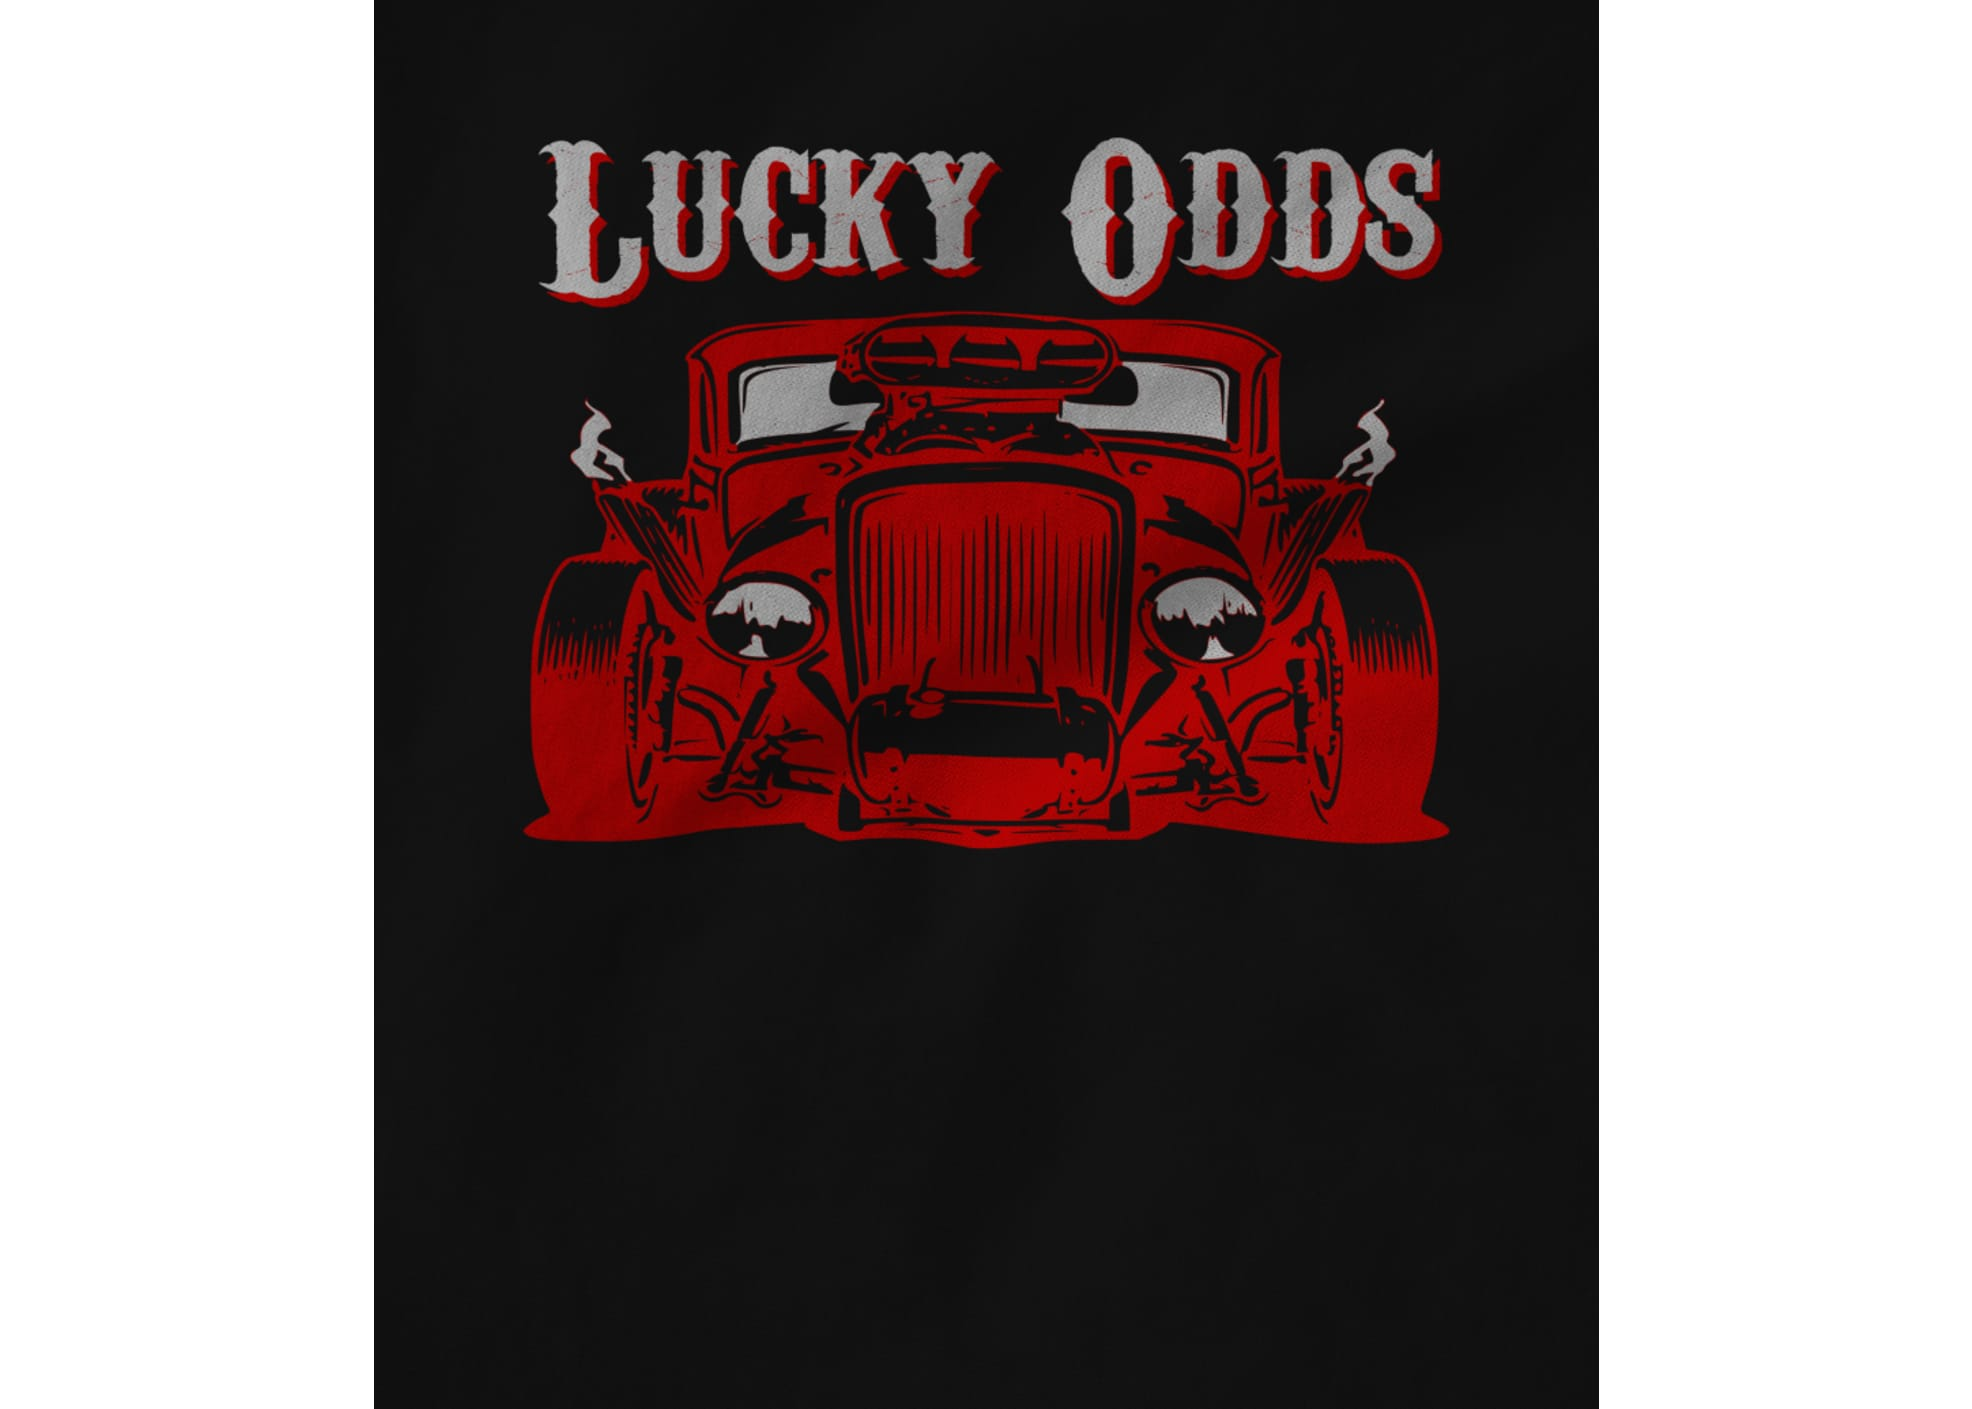 Lucky odds smokin  1499881242